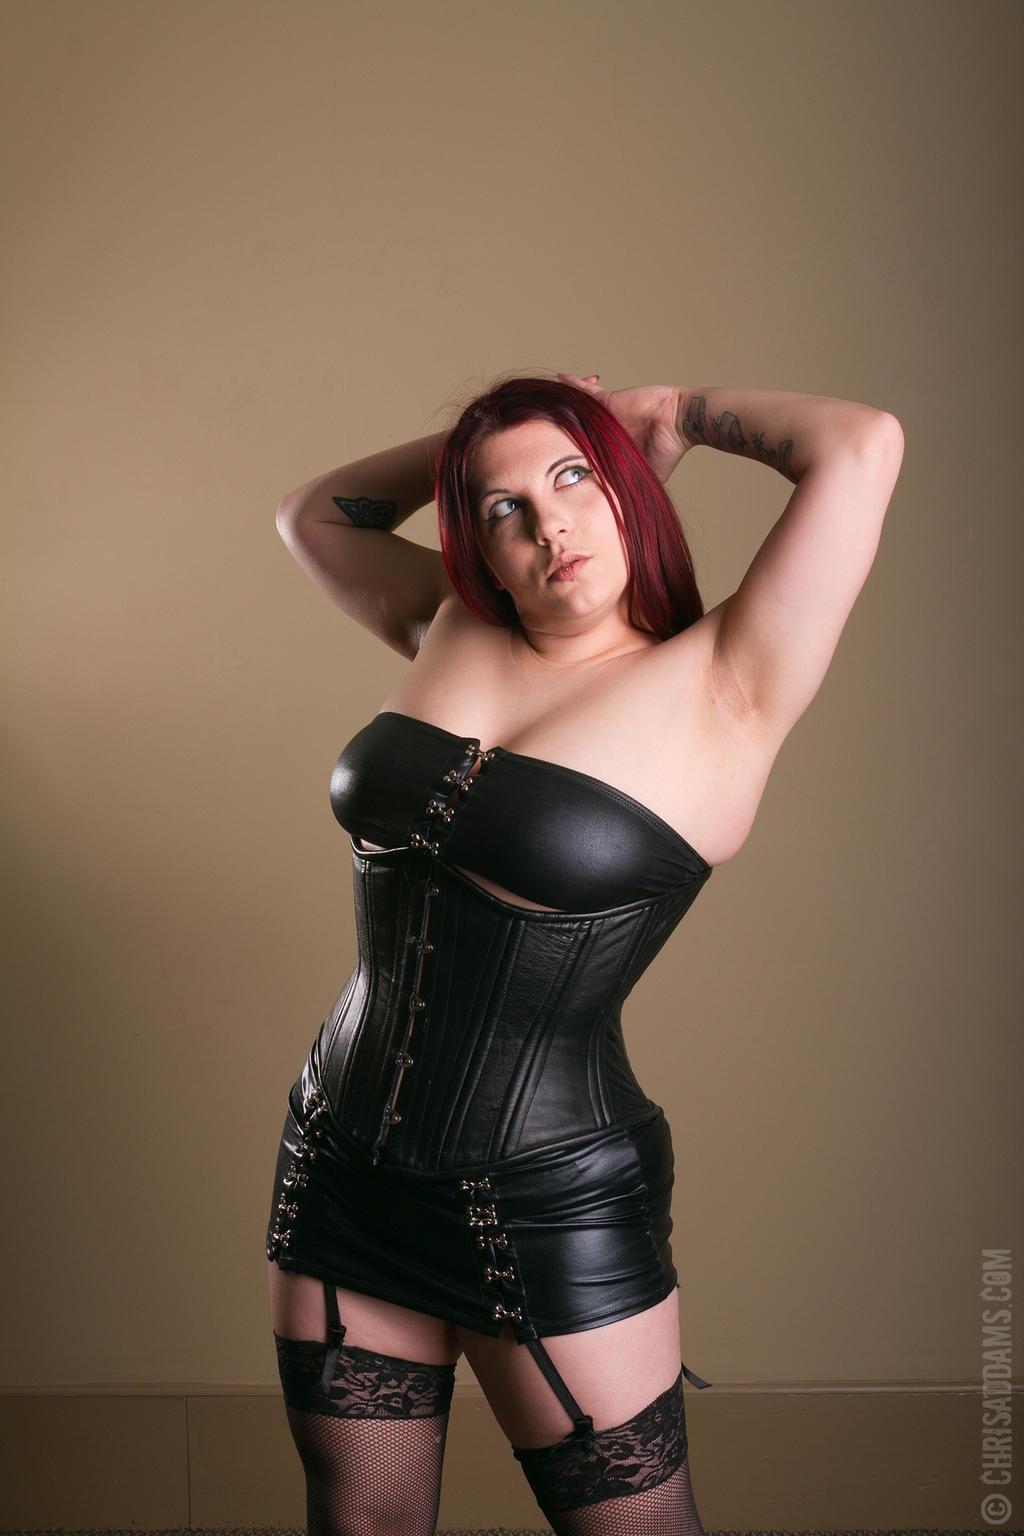 leather ladymorganlefey86 on deviantart